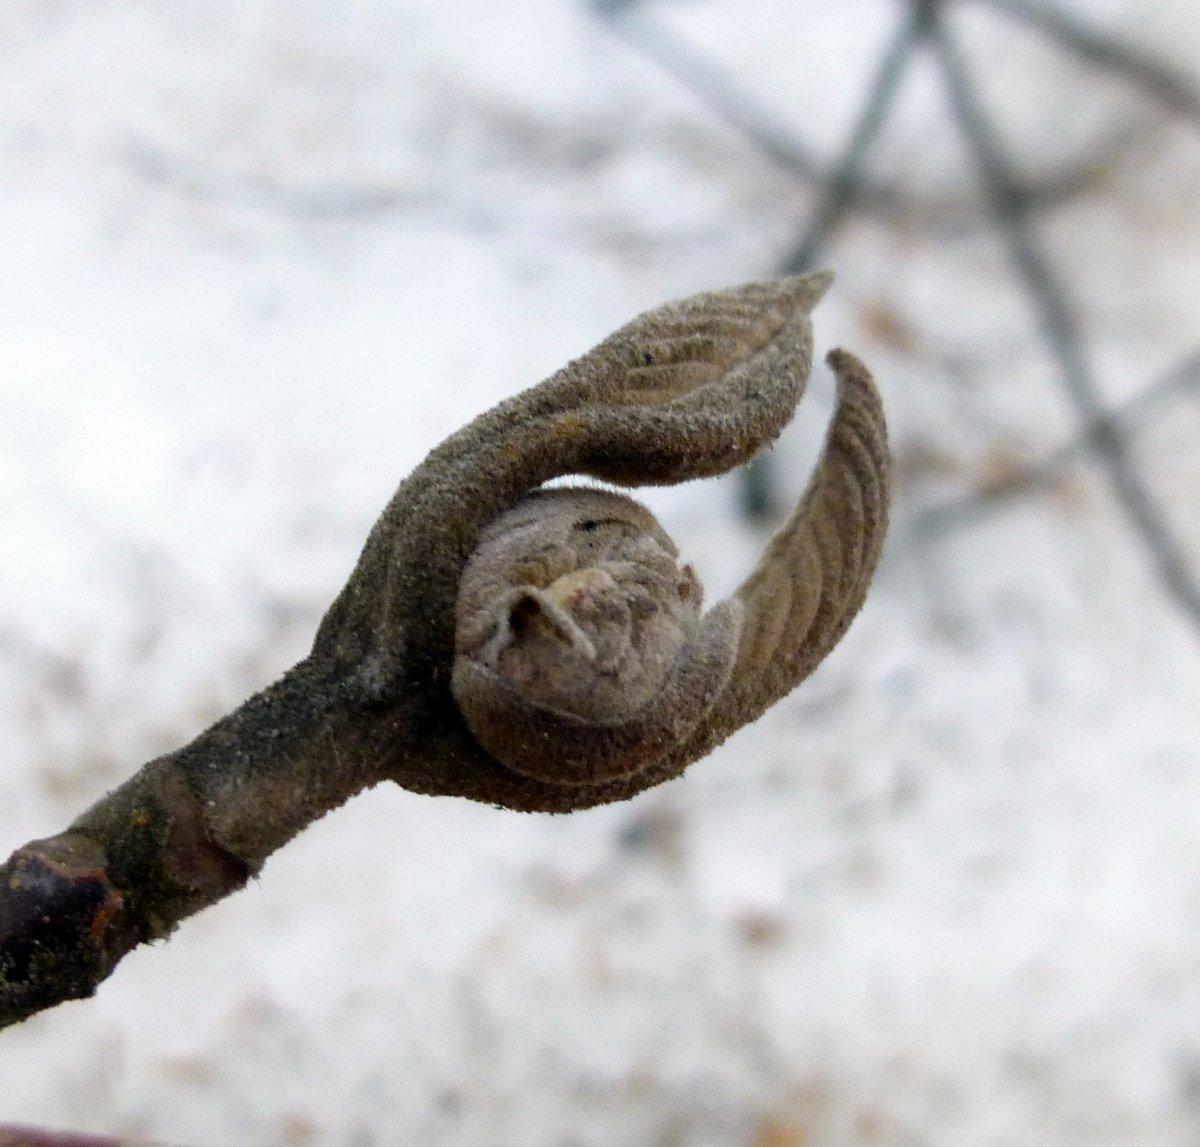 4. Hobblebush Bud aka Viburnum alnifolium